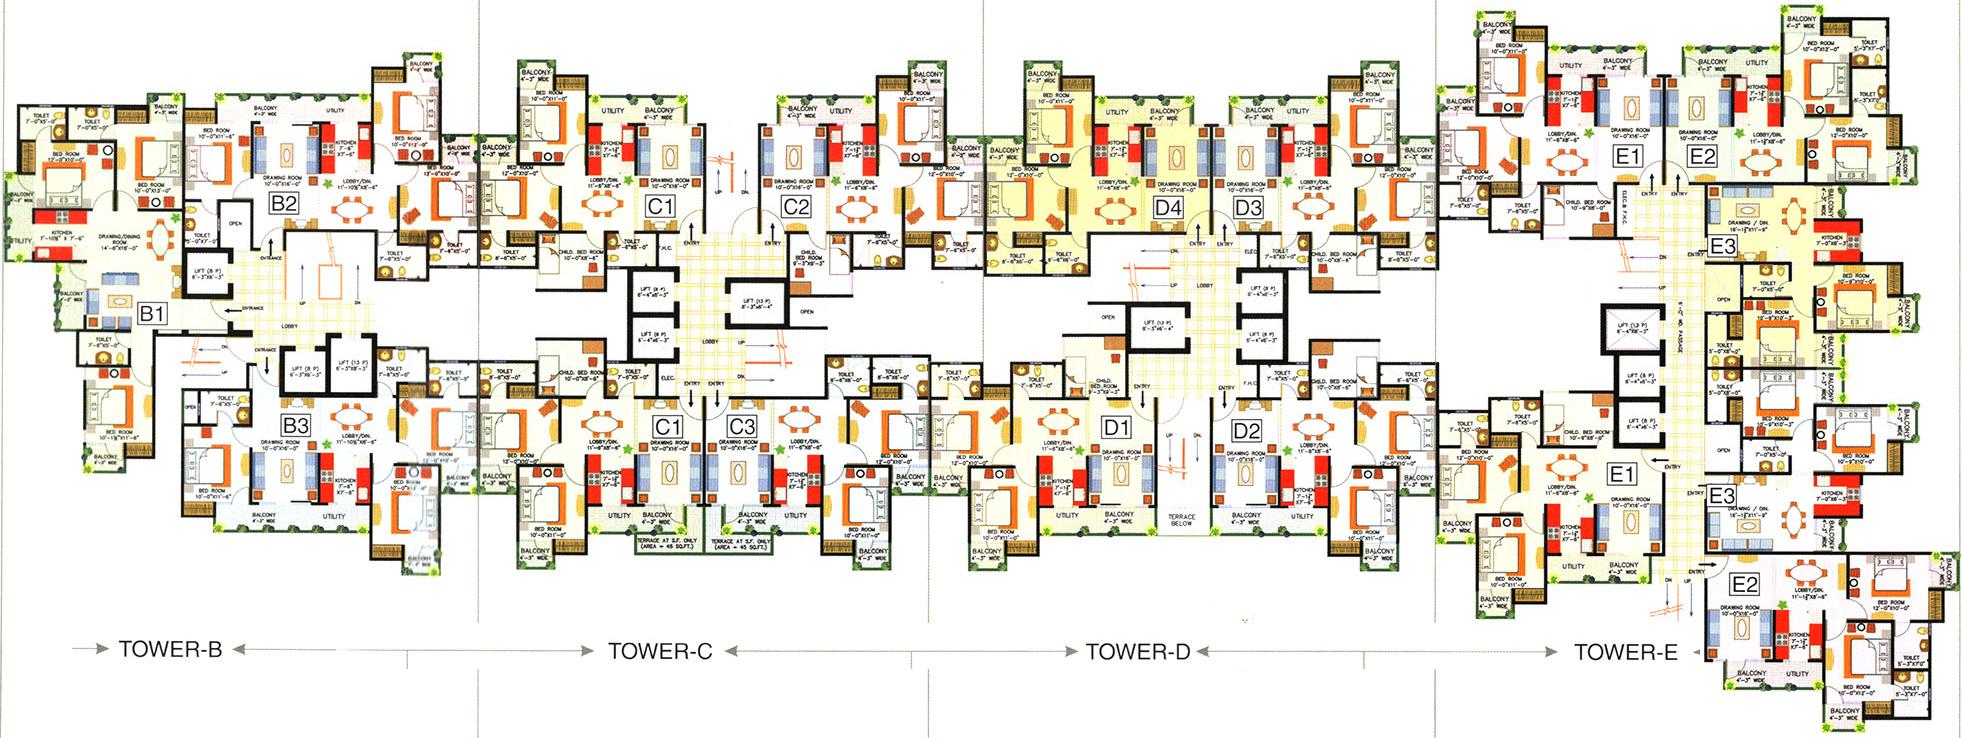 Cloud 9 skylish indirapuram ghaziabad flats in indirapuram price - 3 5